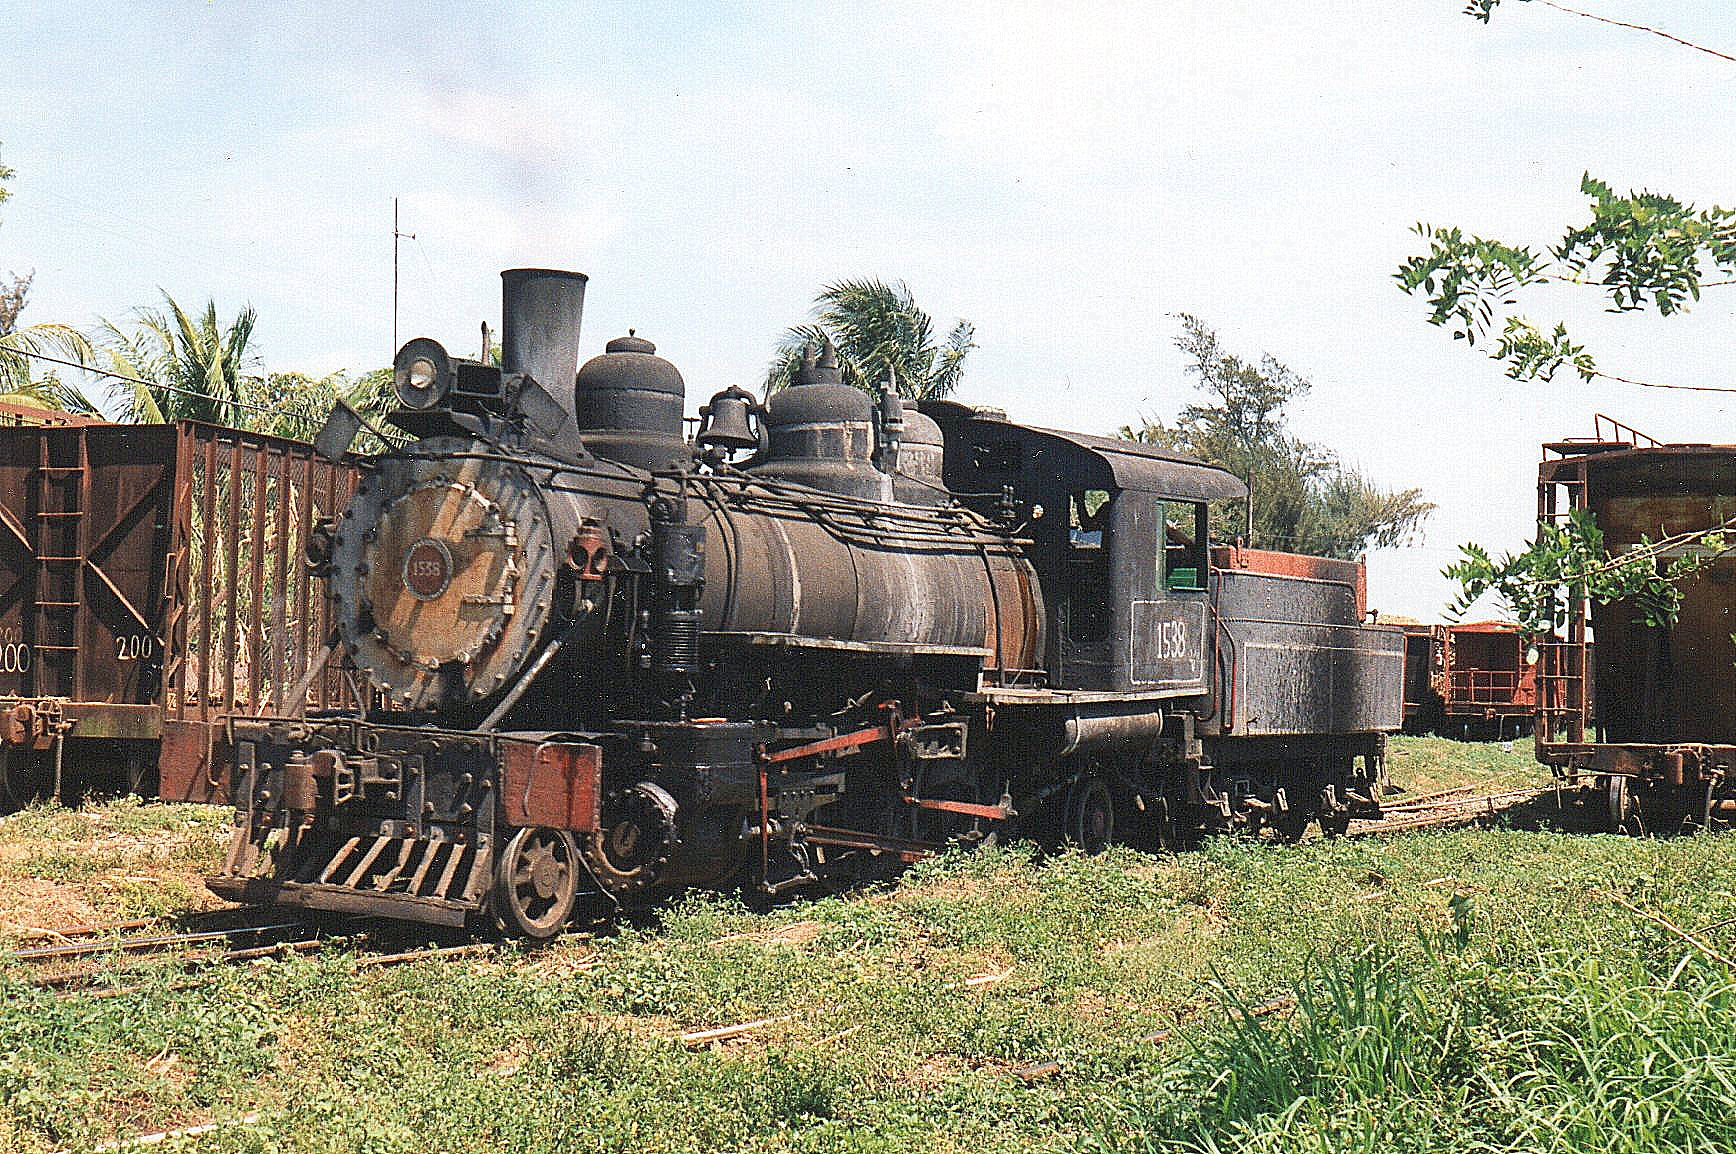 CAI 404, Ciudad Caracas, 1538 Baldwin 54230/1920. 1'C1. Maskinen var i drift.